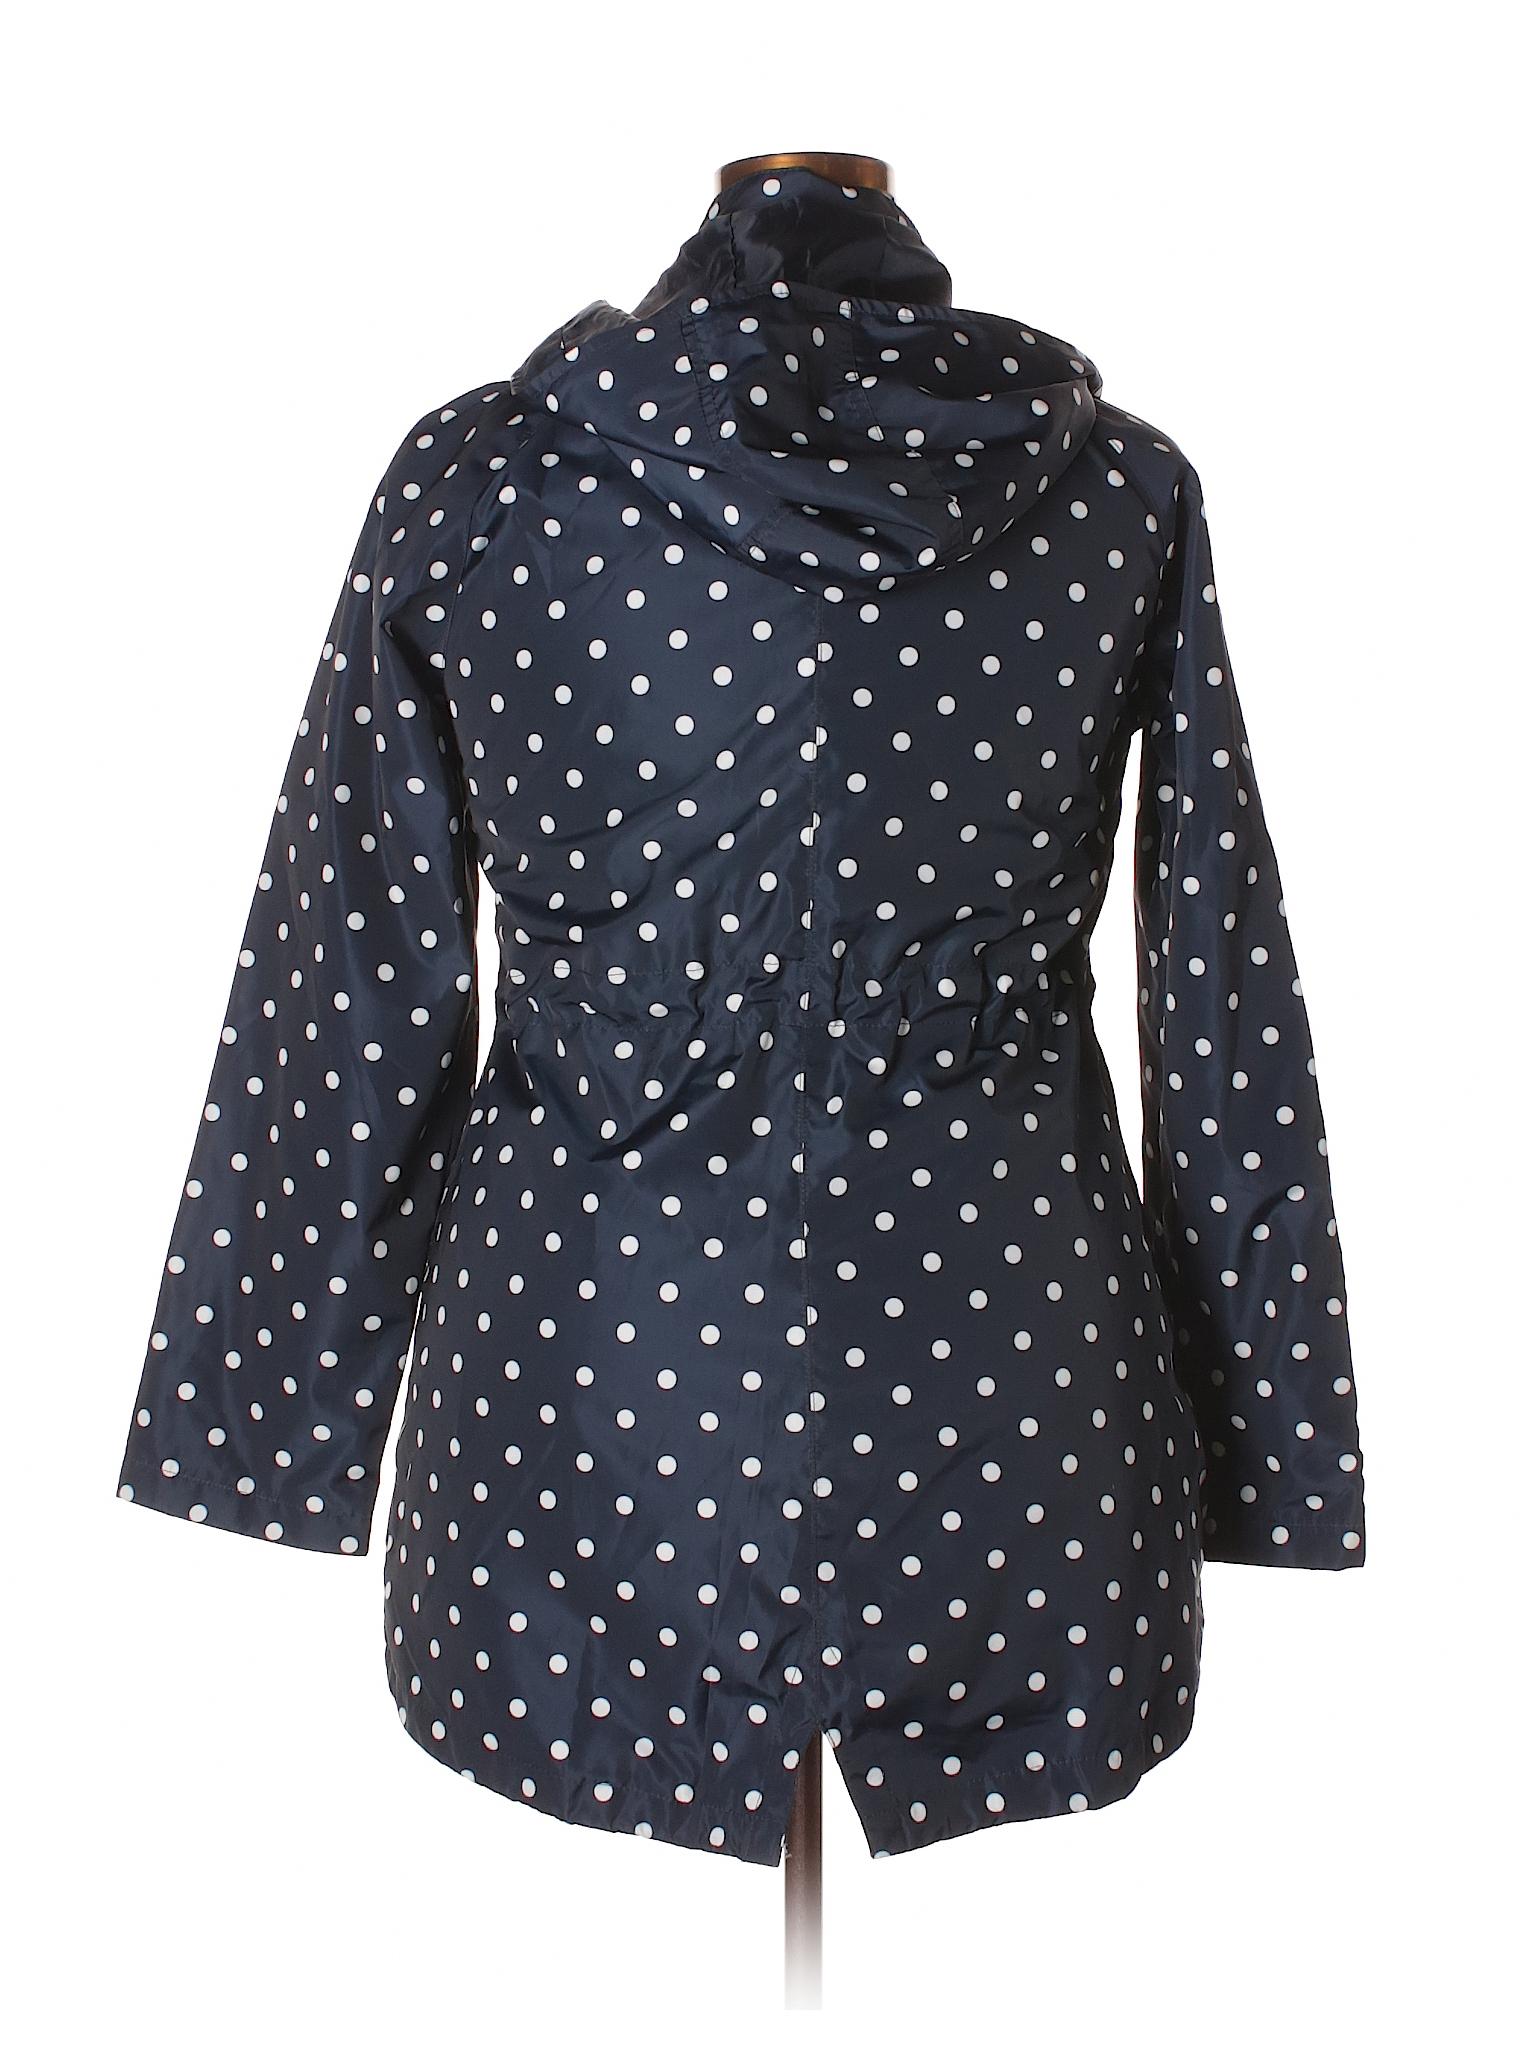 0231a7b56 Merona 100% Polyester Polka Dots Dark Blue Raincoat Size XL - 55 ...